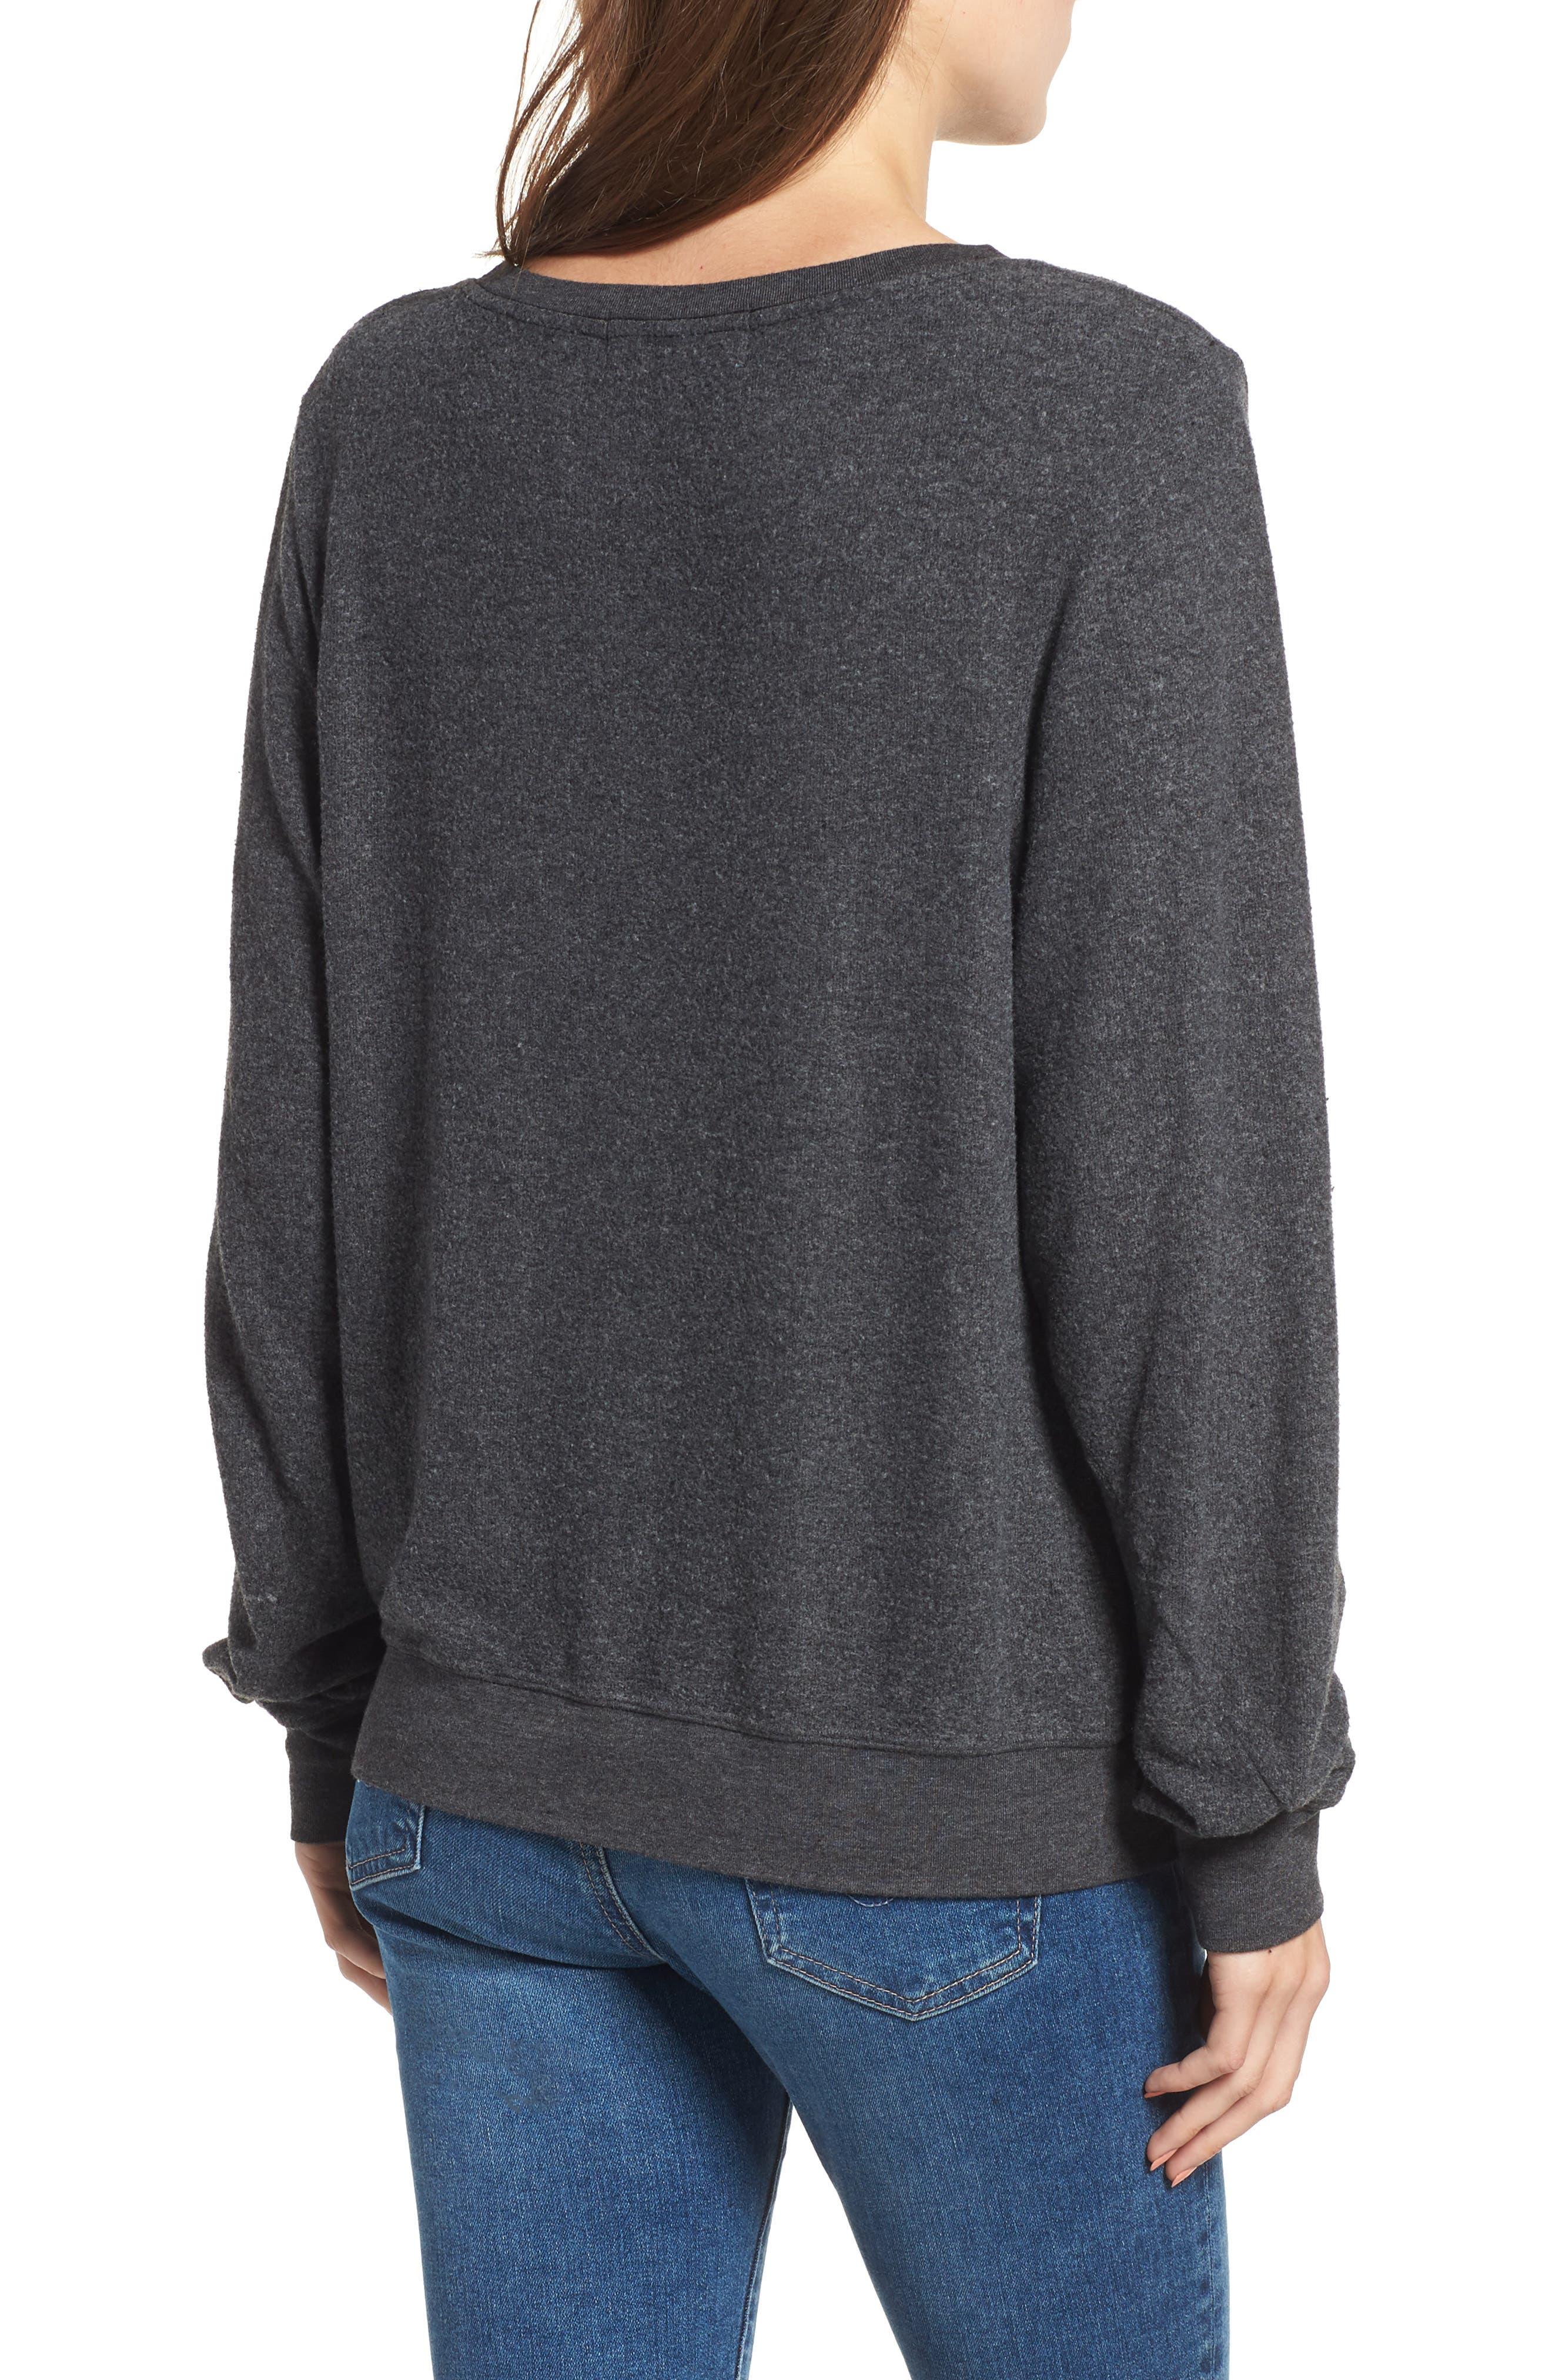 Smooches Baggy Beach Jumper Sweatshirt,                             Alternate thumbnail 2, color,                             002